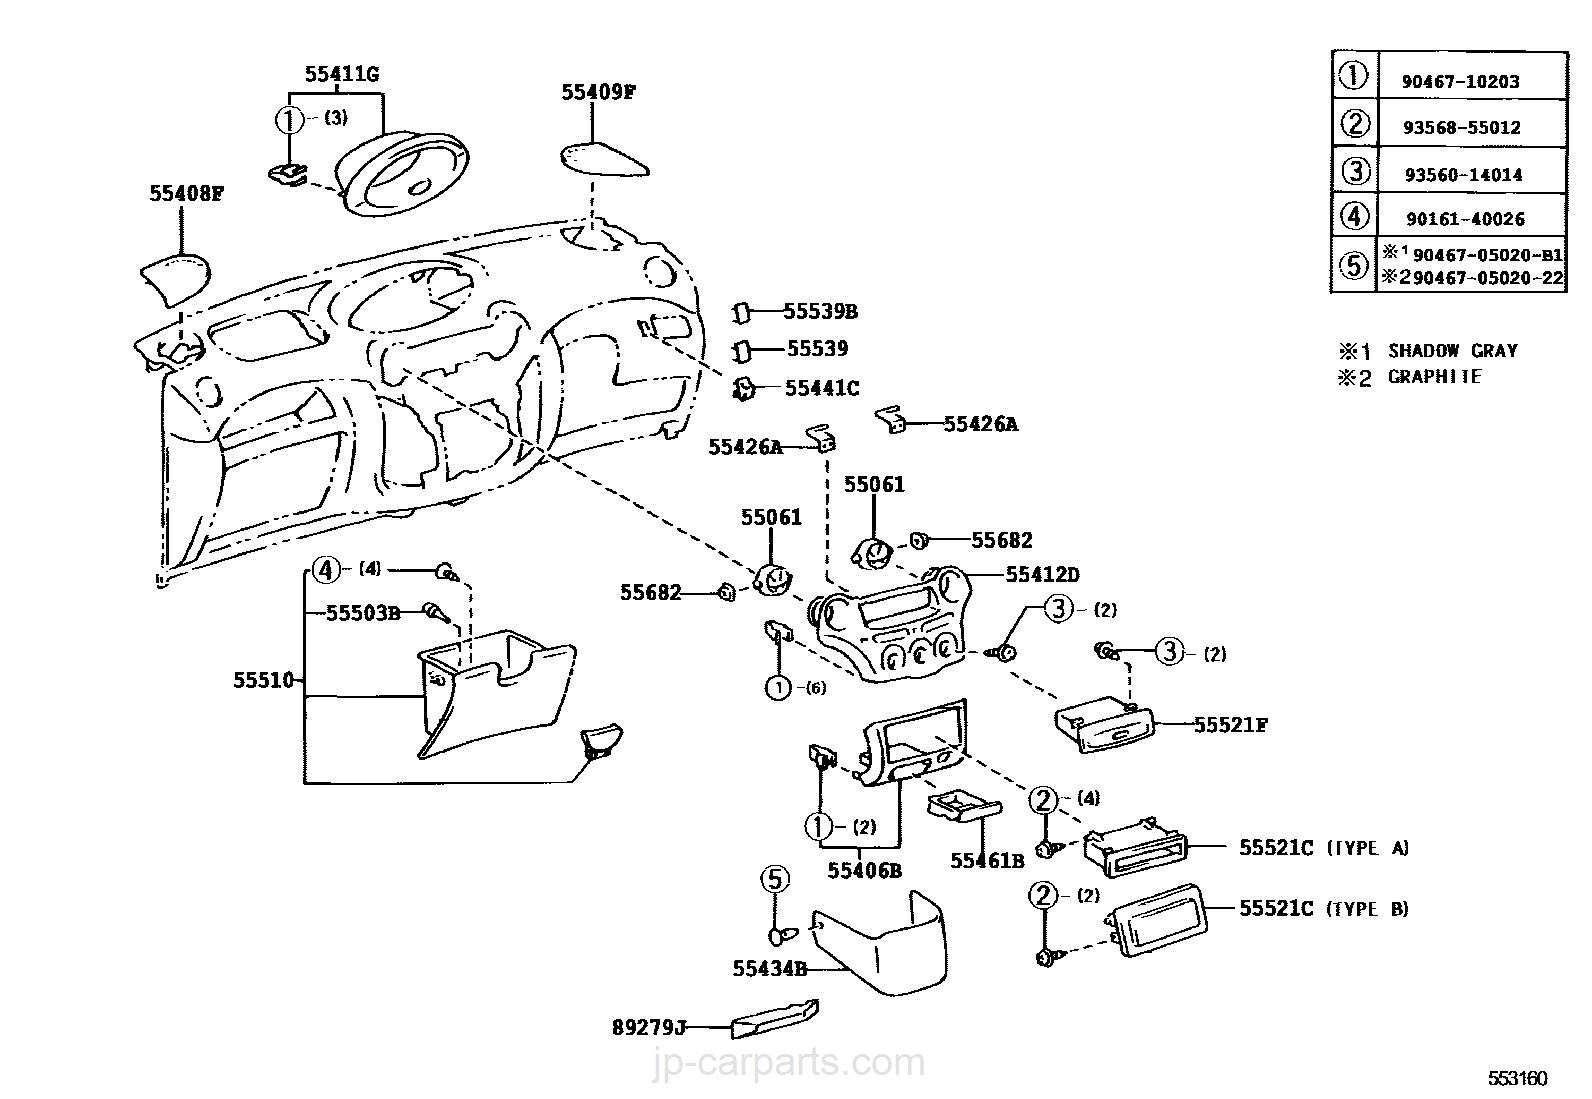 Genuine Hyundai 84610-21500-DT Center Console Assembly